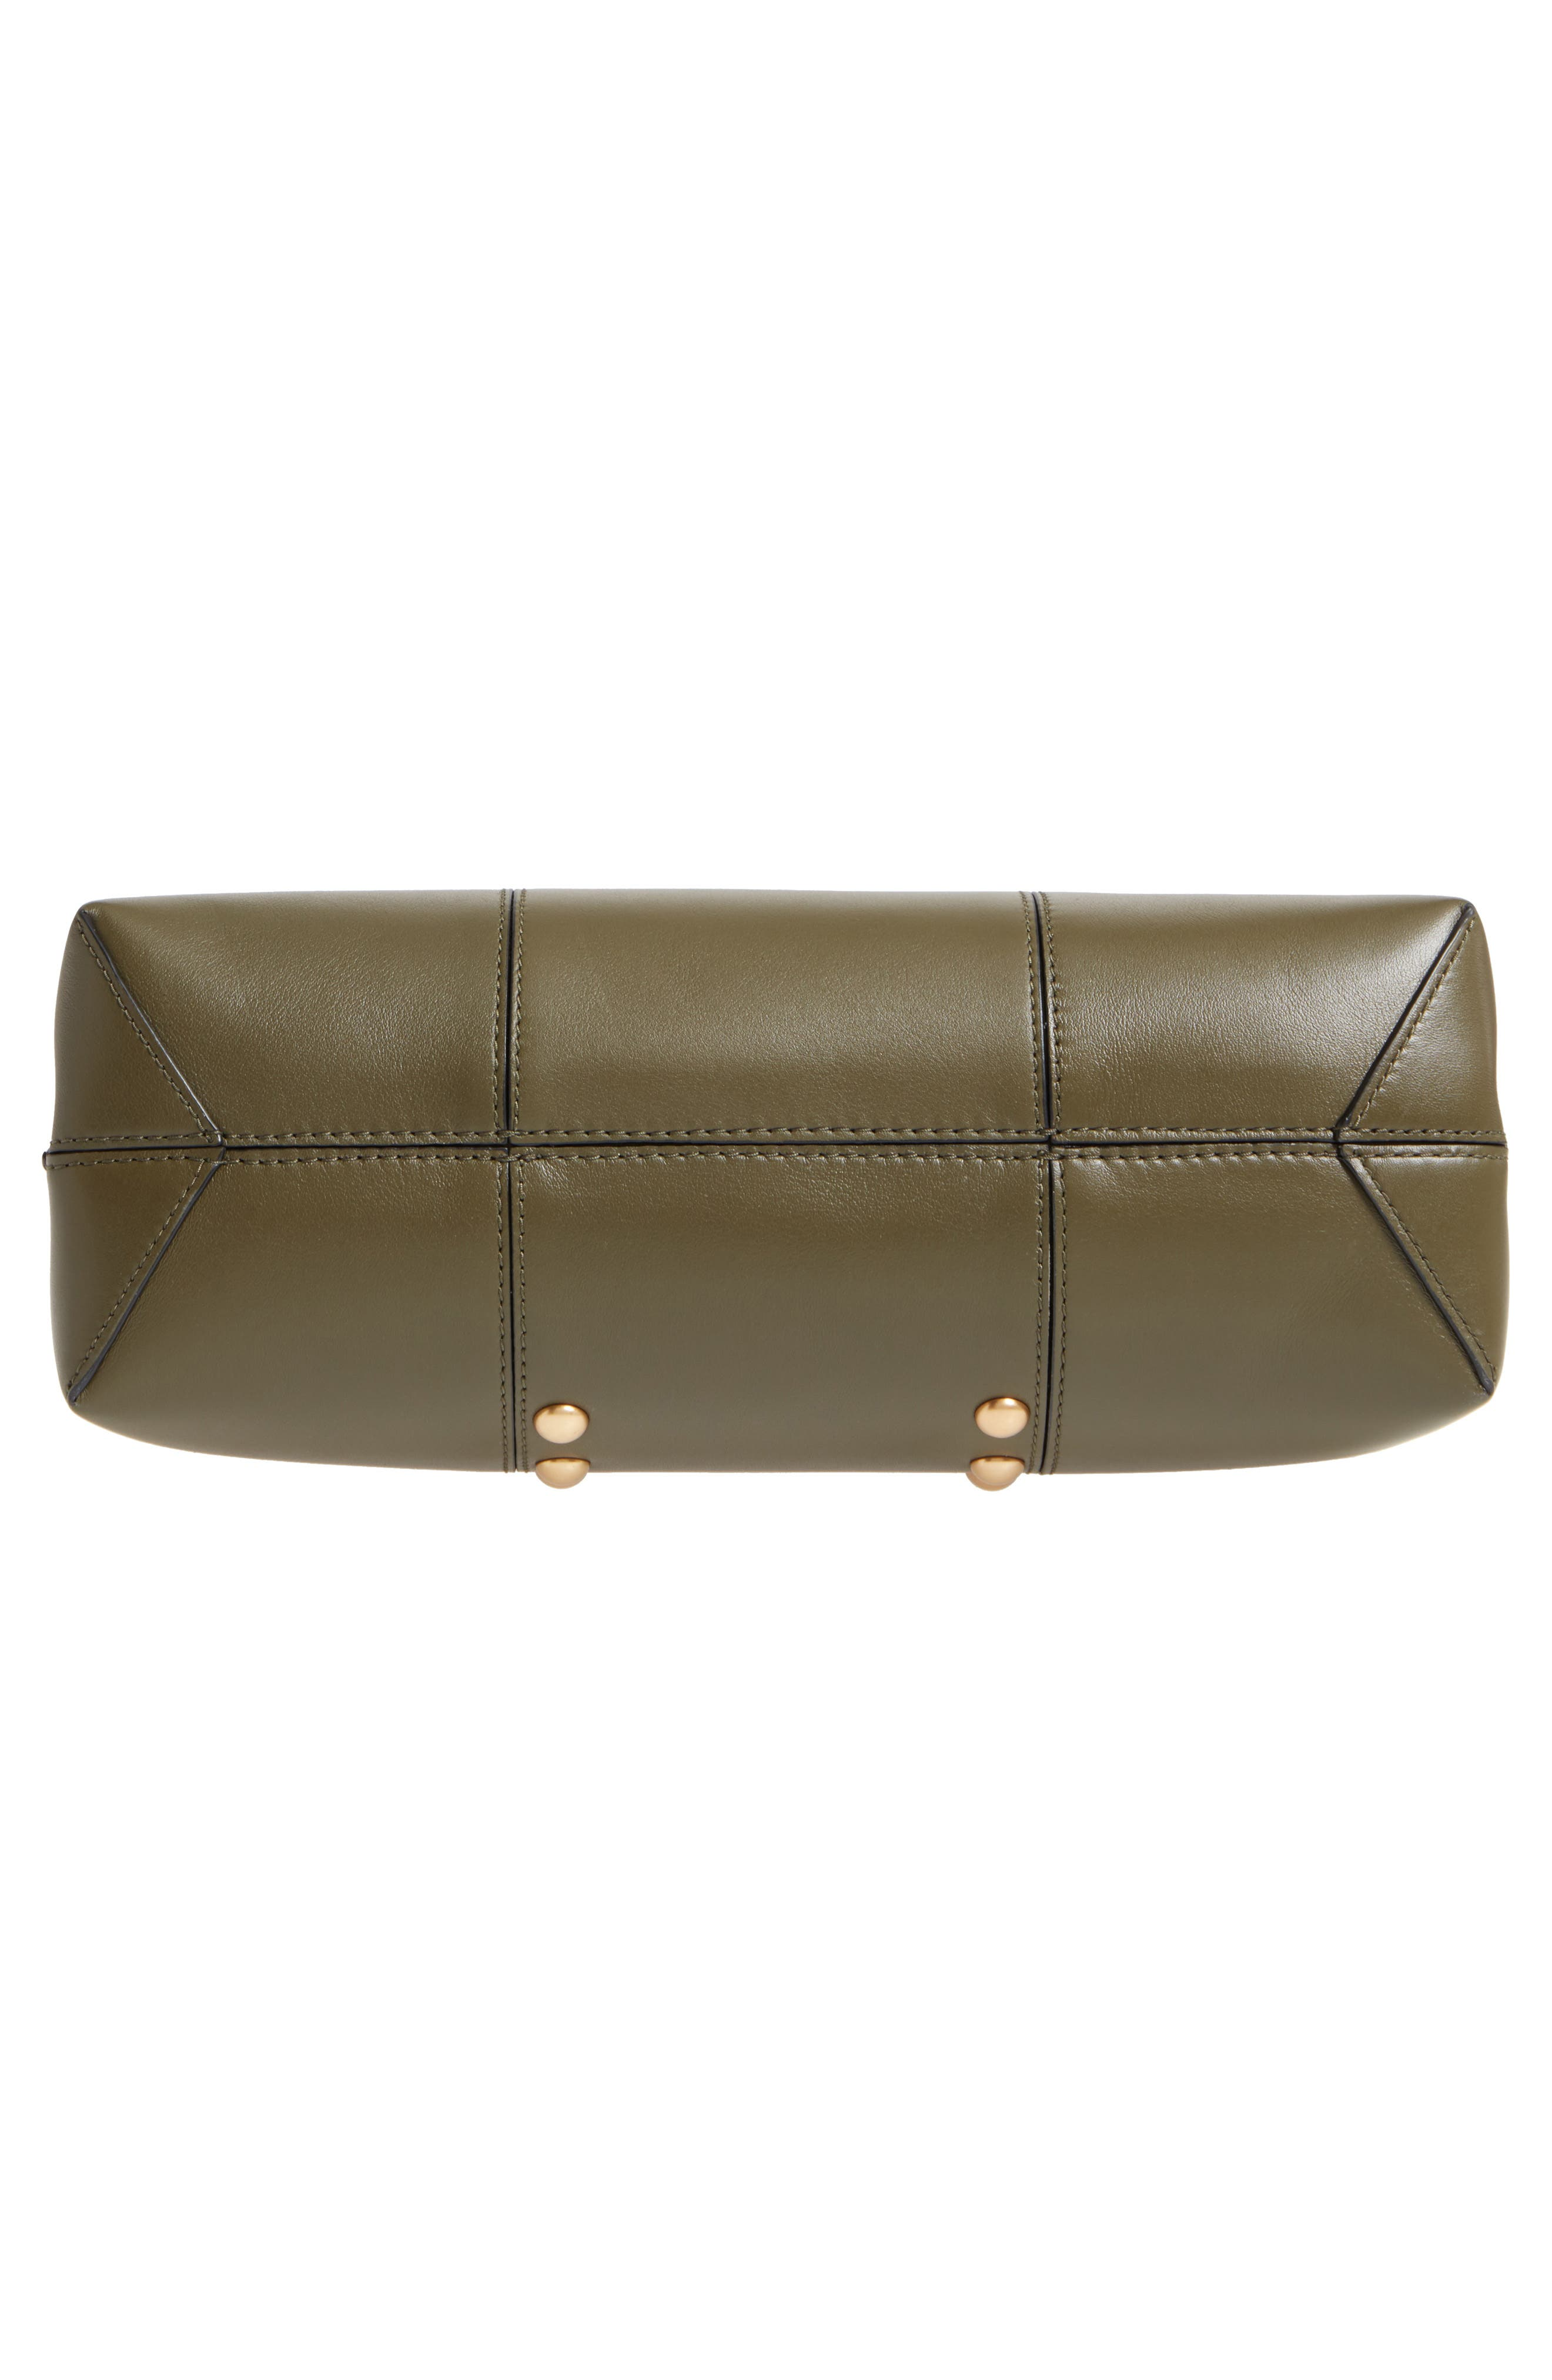 Block-T Studded Leather Top Handle Satchel,                             Alternate thumbnail 6, color,                             300